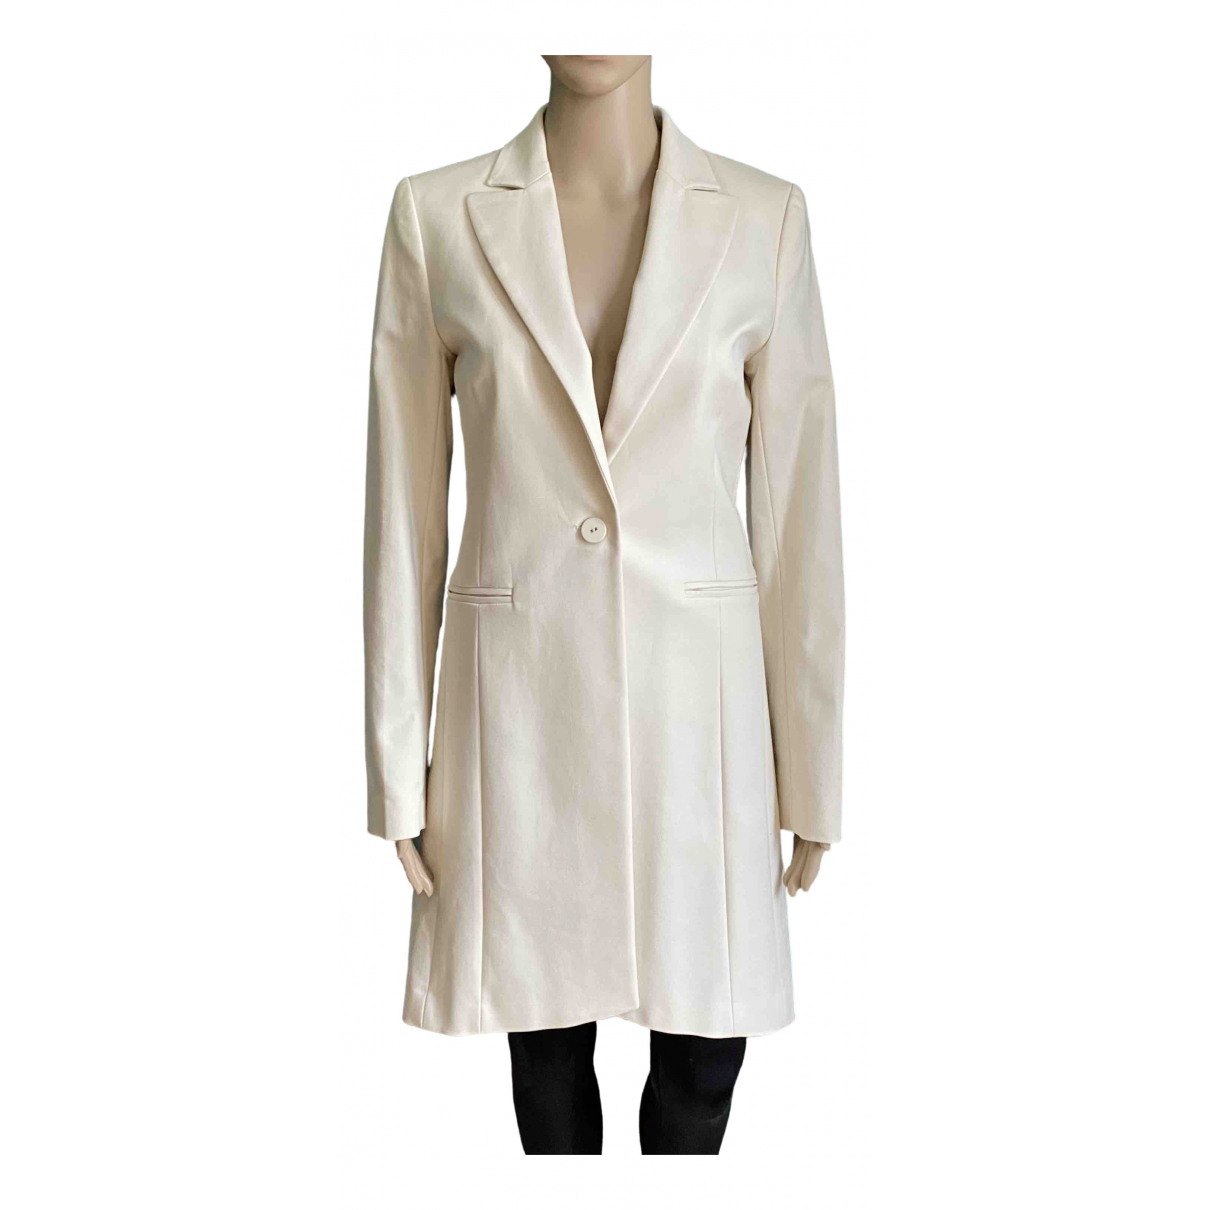 Twin Set \N Ecru Cotton coat for Women S International